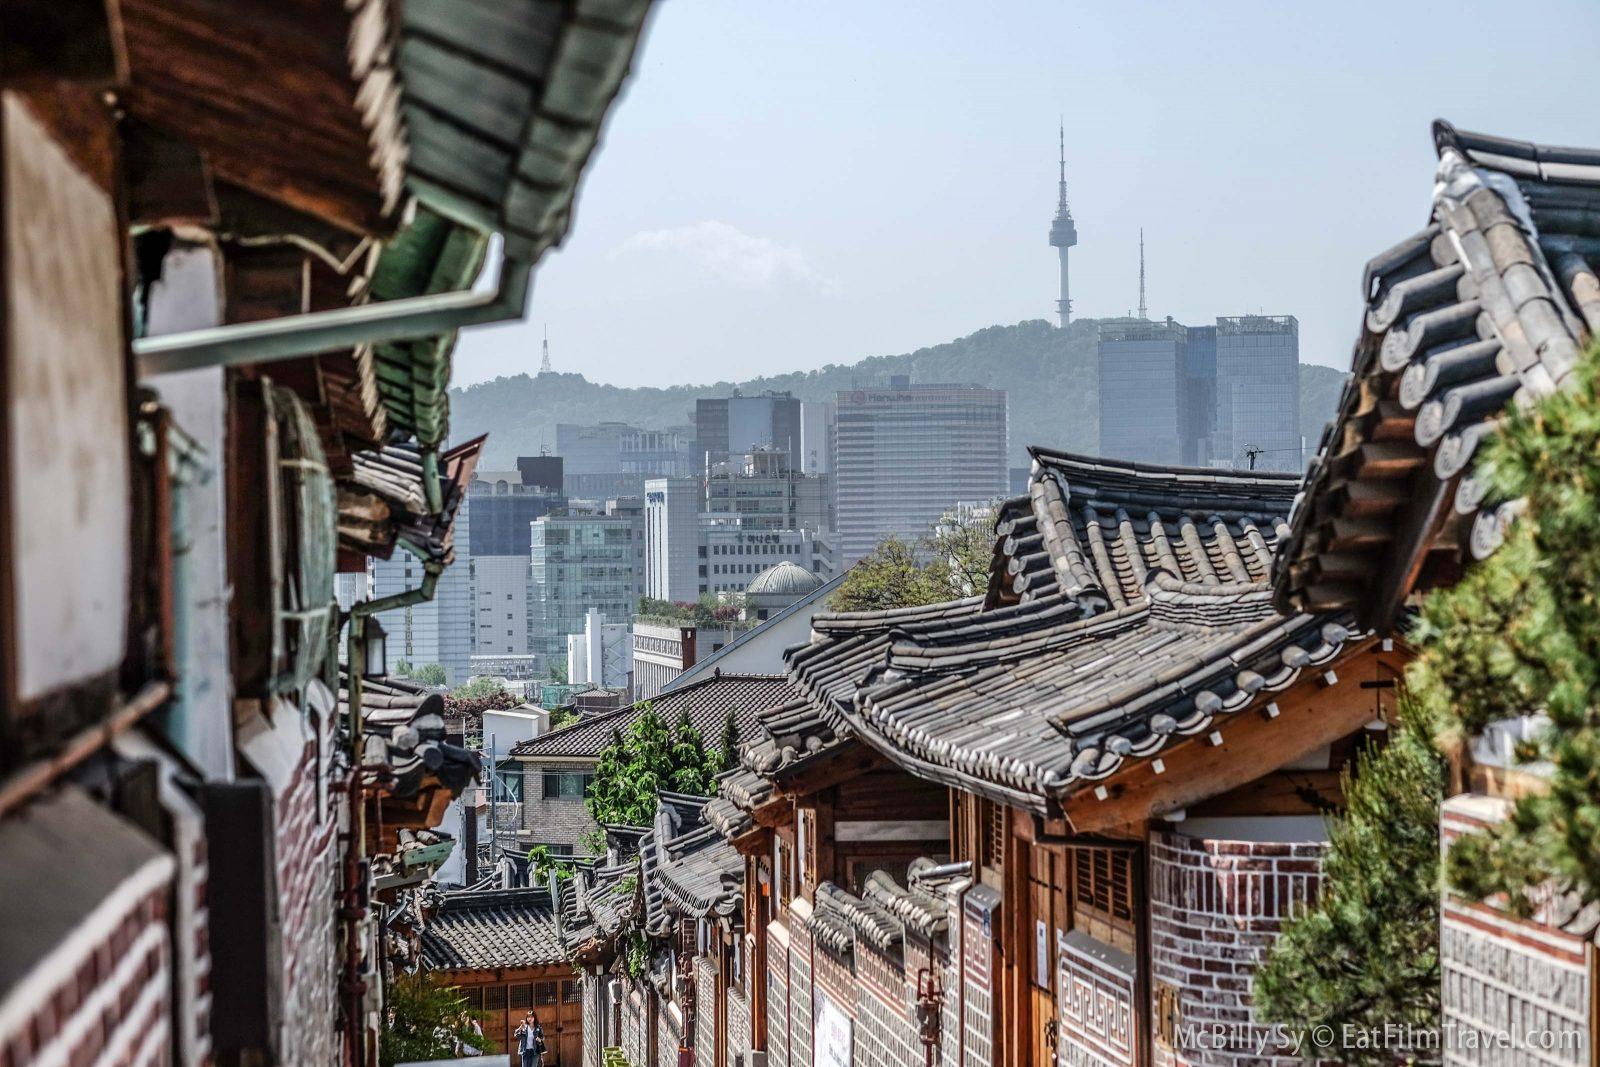 Bukchon Hanok Village in Seoul Korea